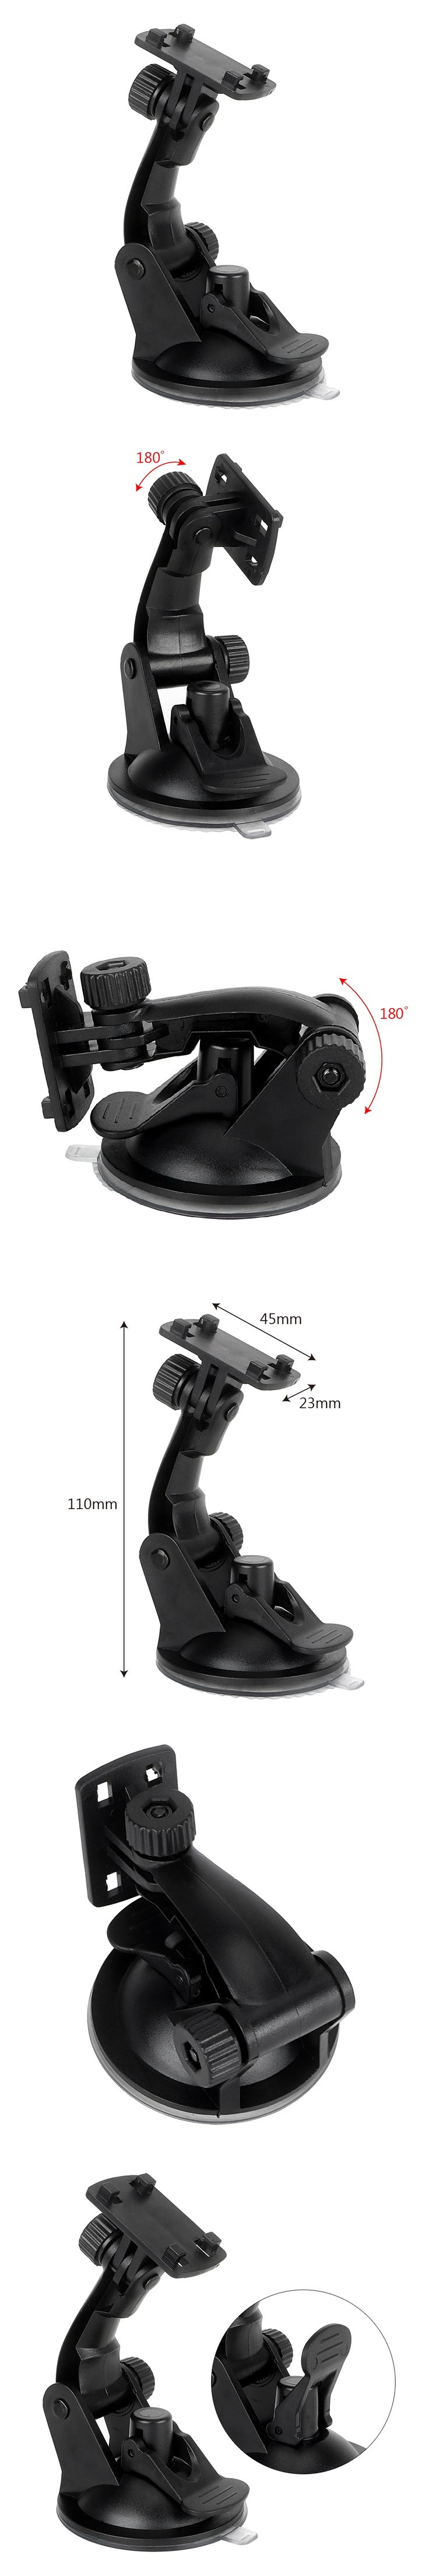 Universal Phone Holder Windshield Bracket 360 Degrees Steering Portable For Car GPS Recorder DVR Camera Auto Mounts